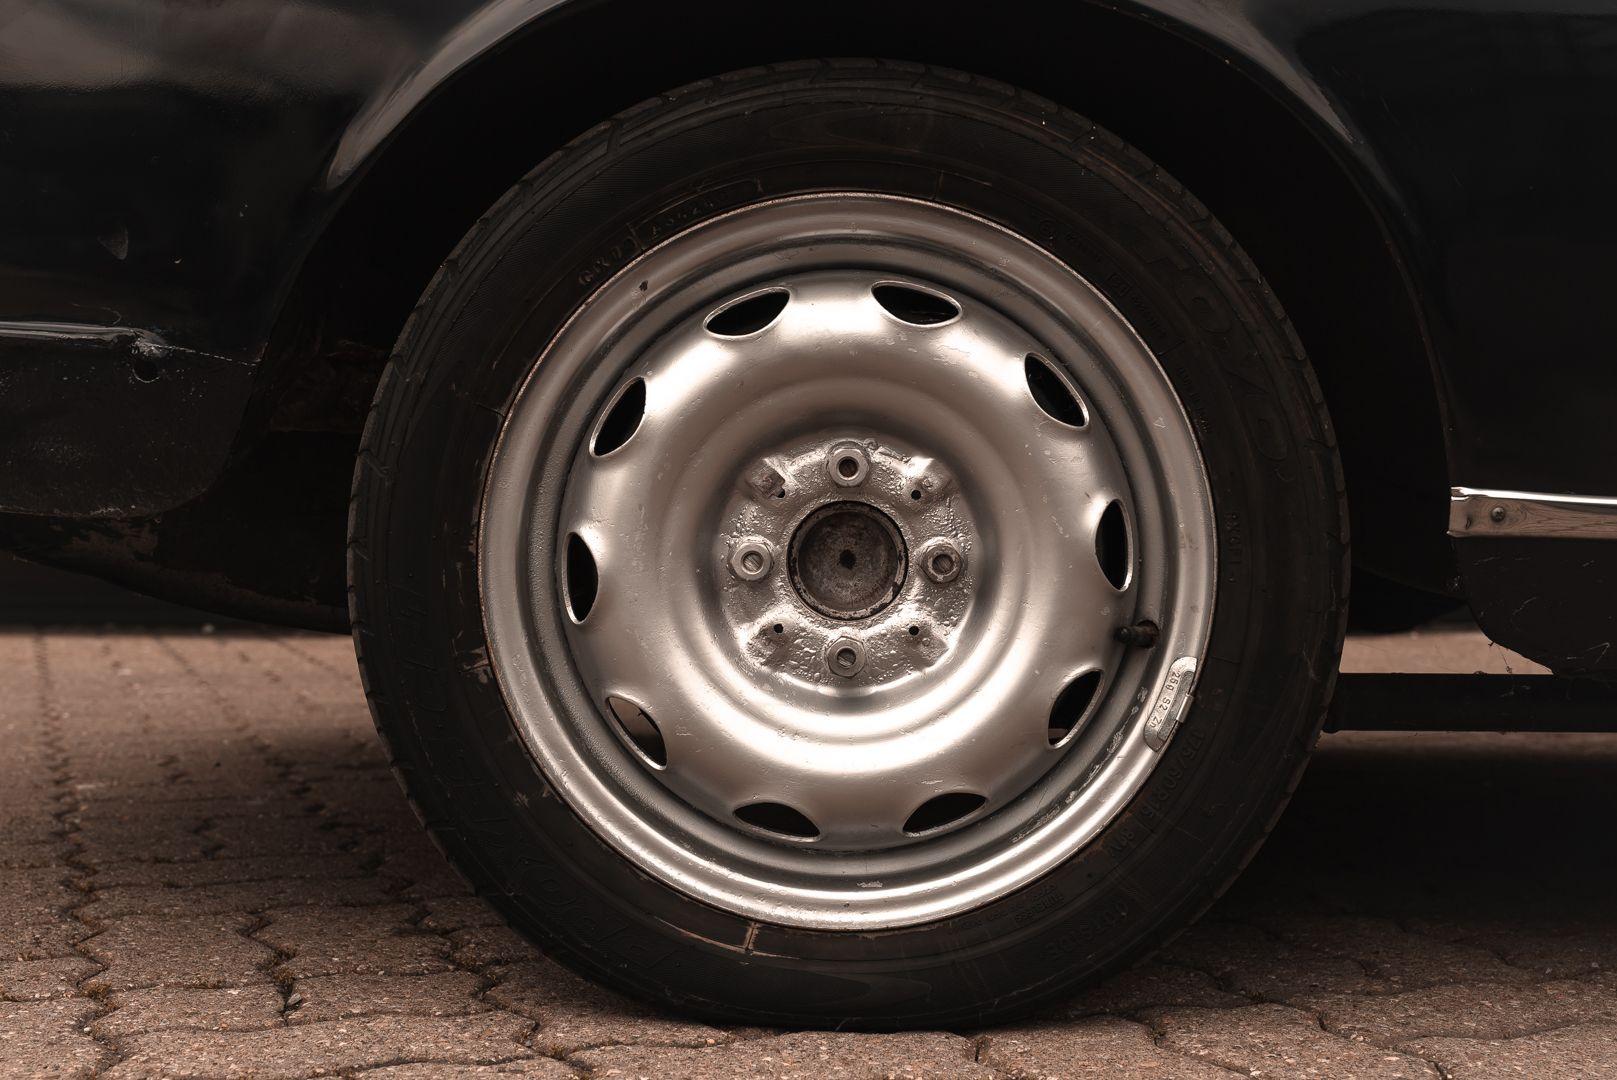 1962 Alfa Romeo Giulietta Sprint 1300 Race Car 69396